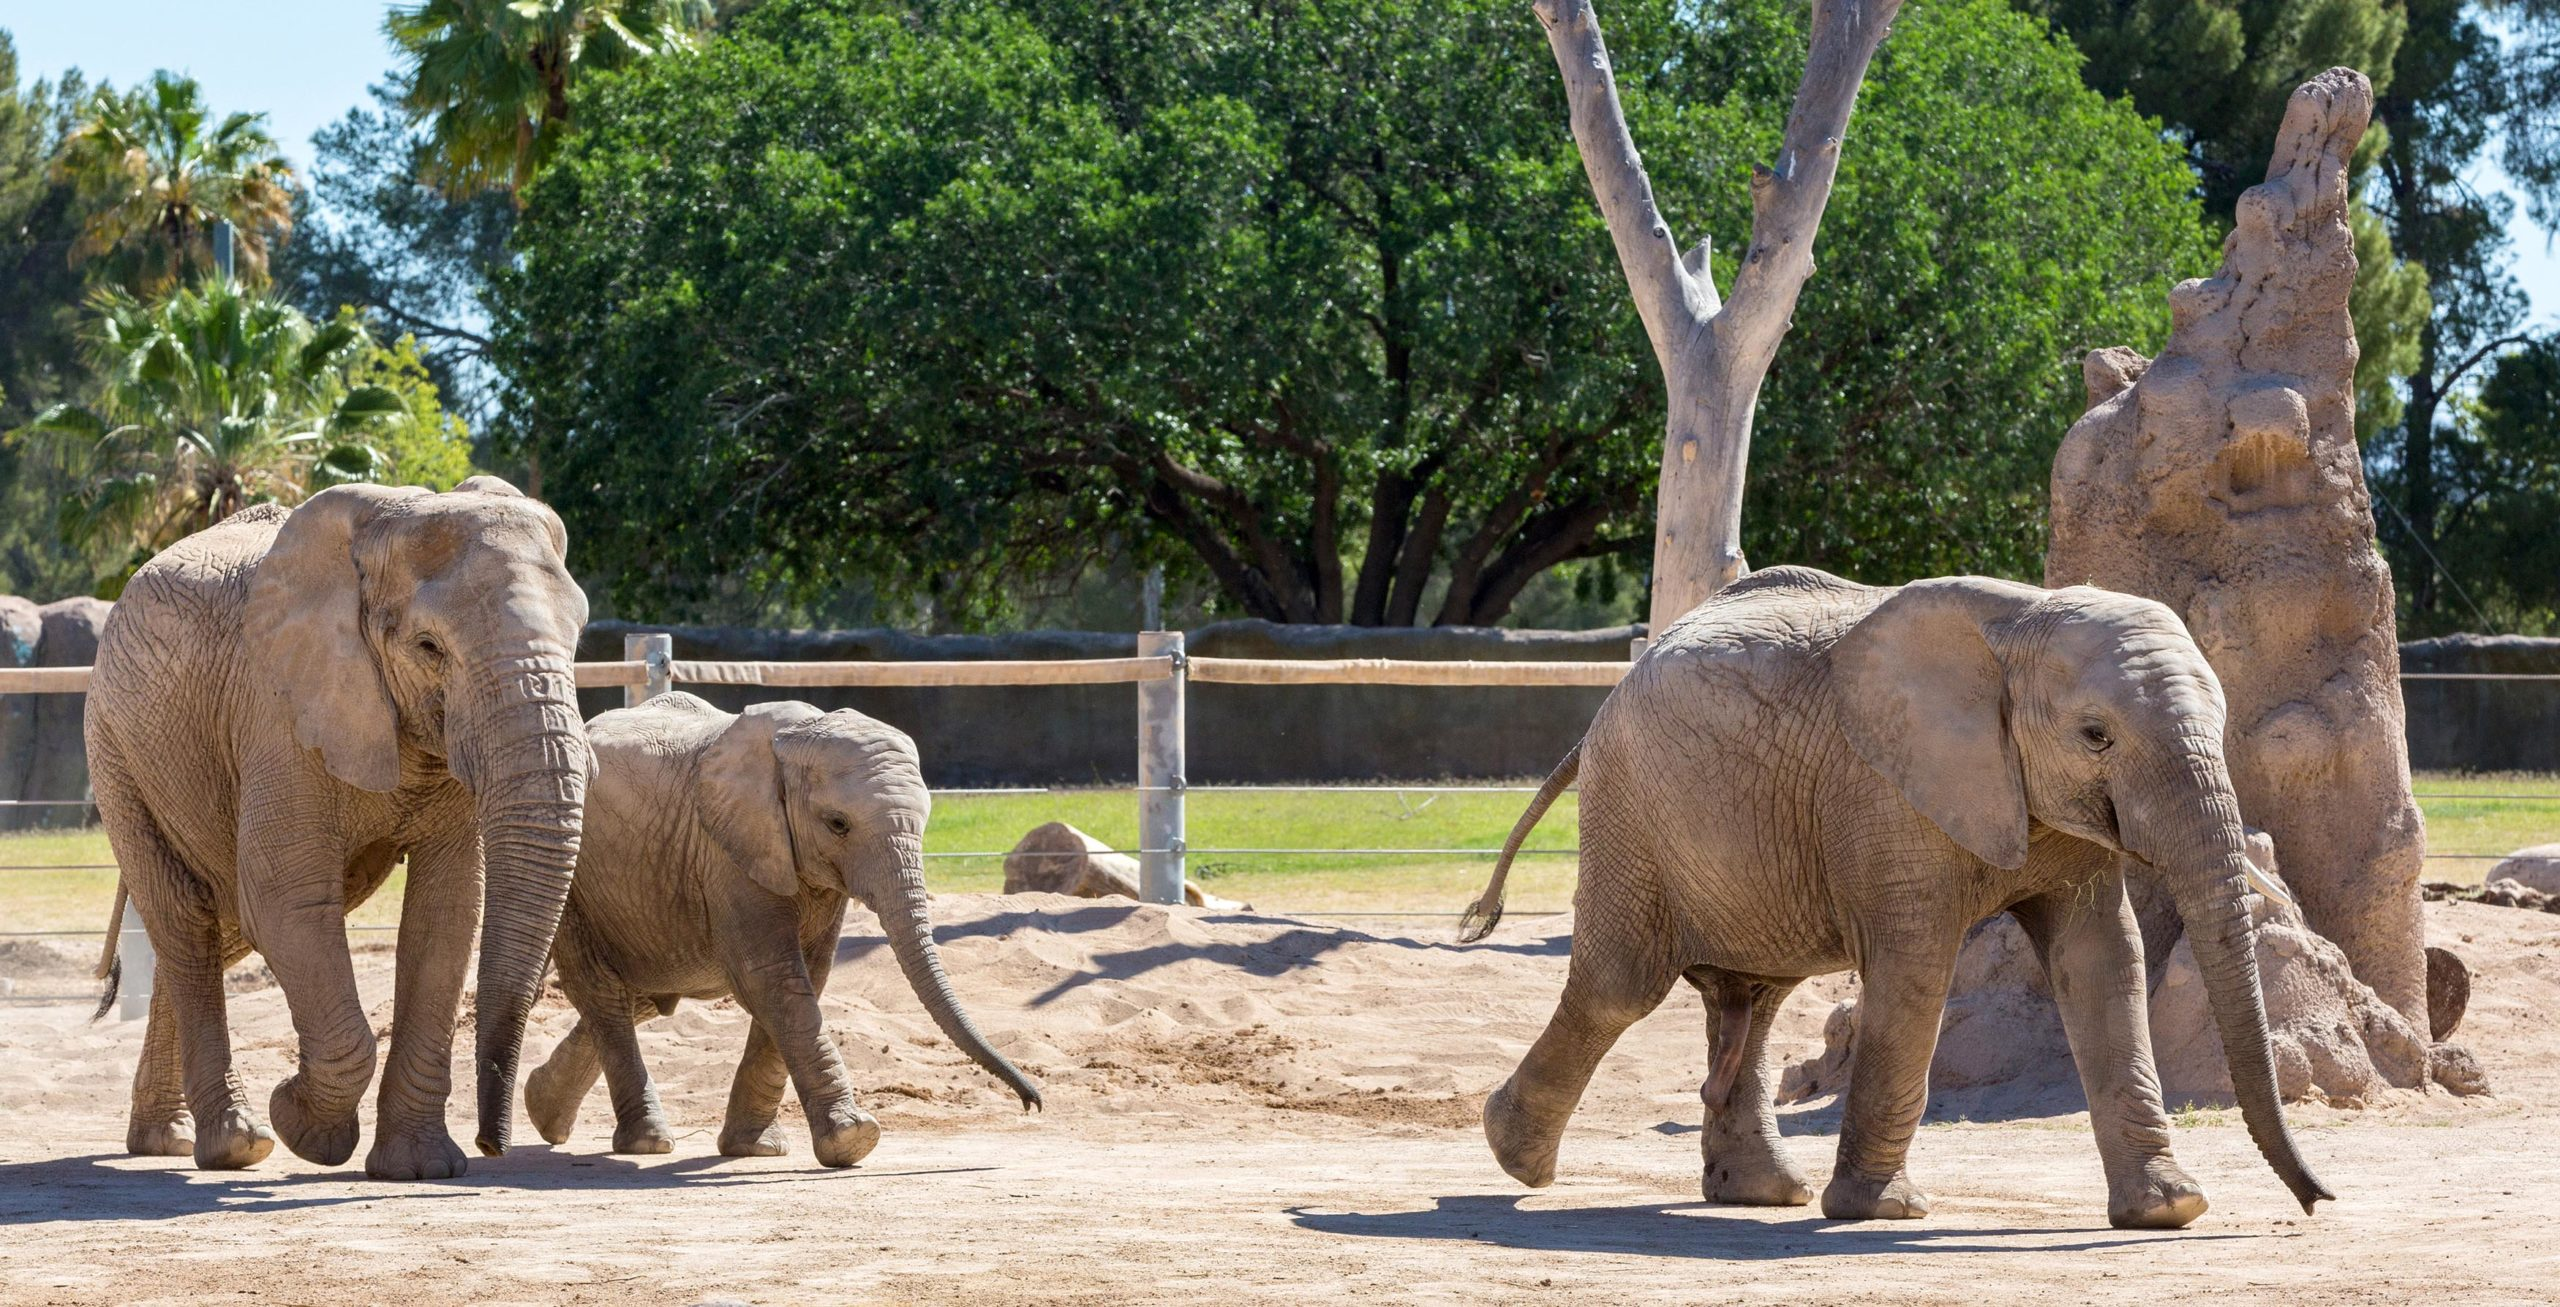 August Culture Pass Spotlight: Reid Park Zoo